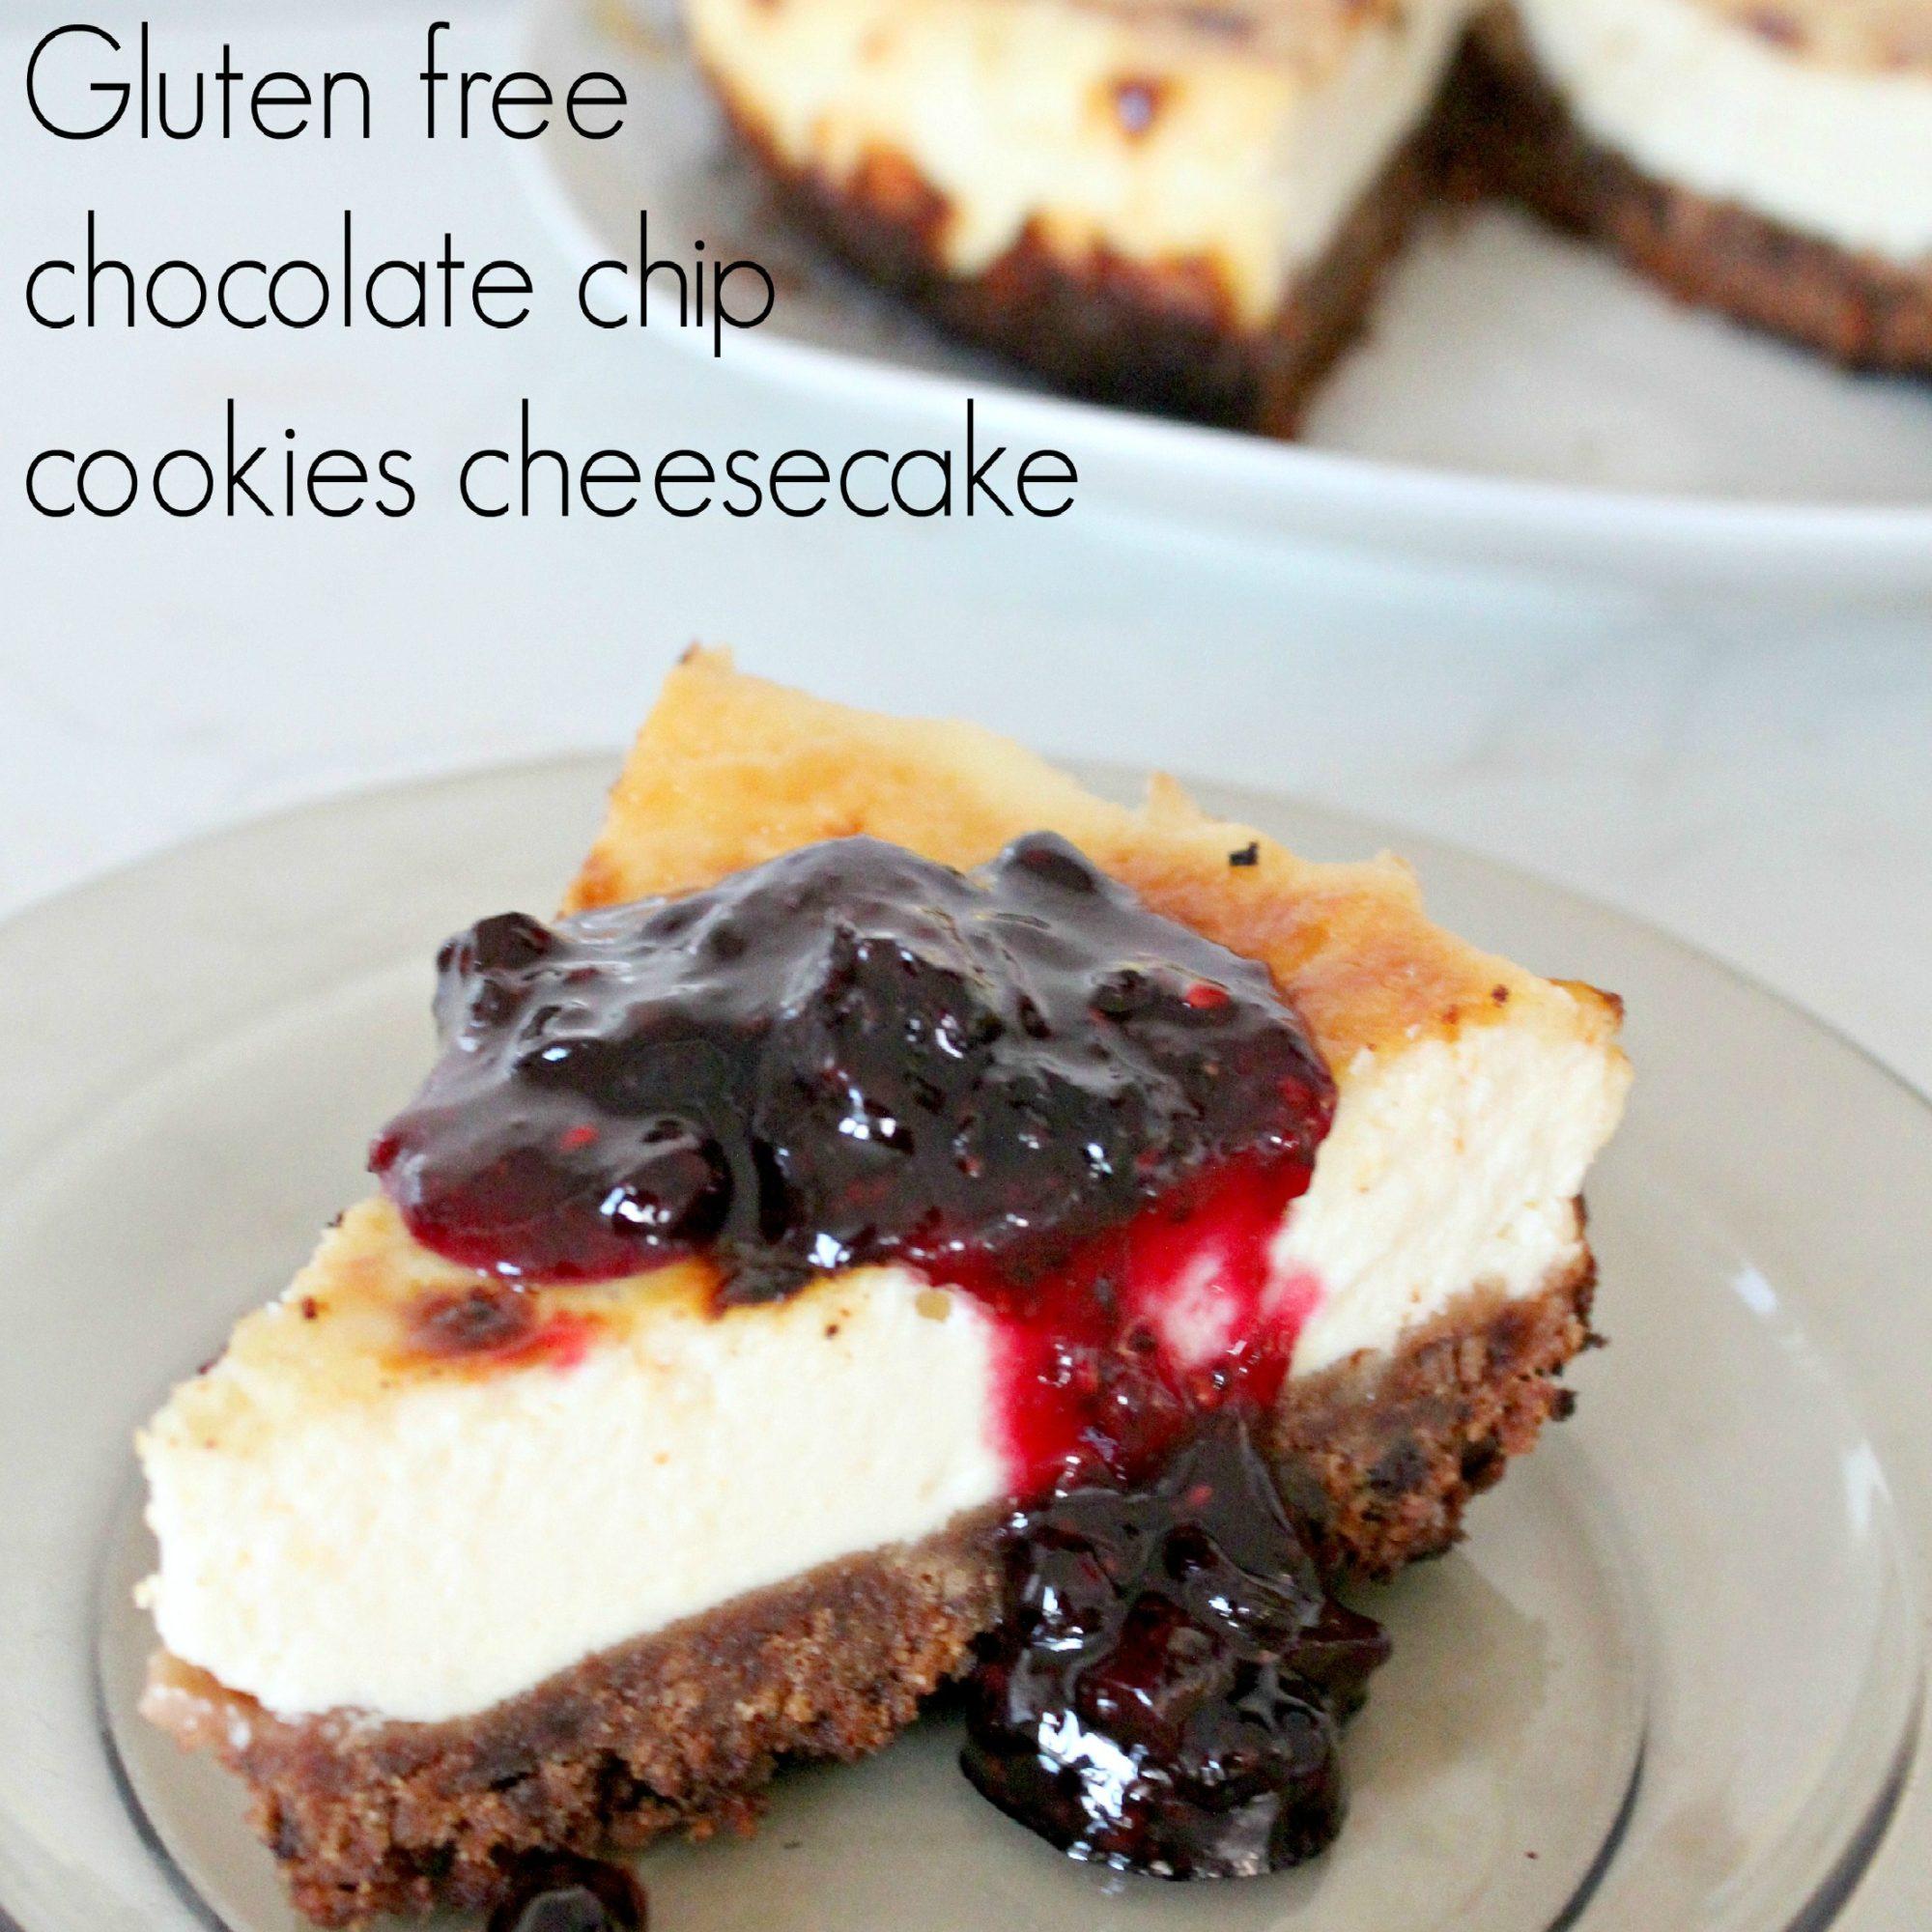 Gluten free chocolate chip cookie cheesecake recipe